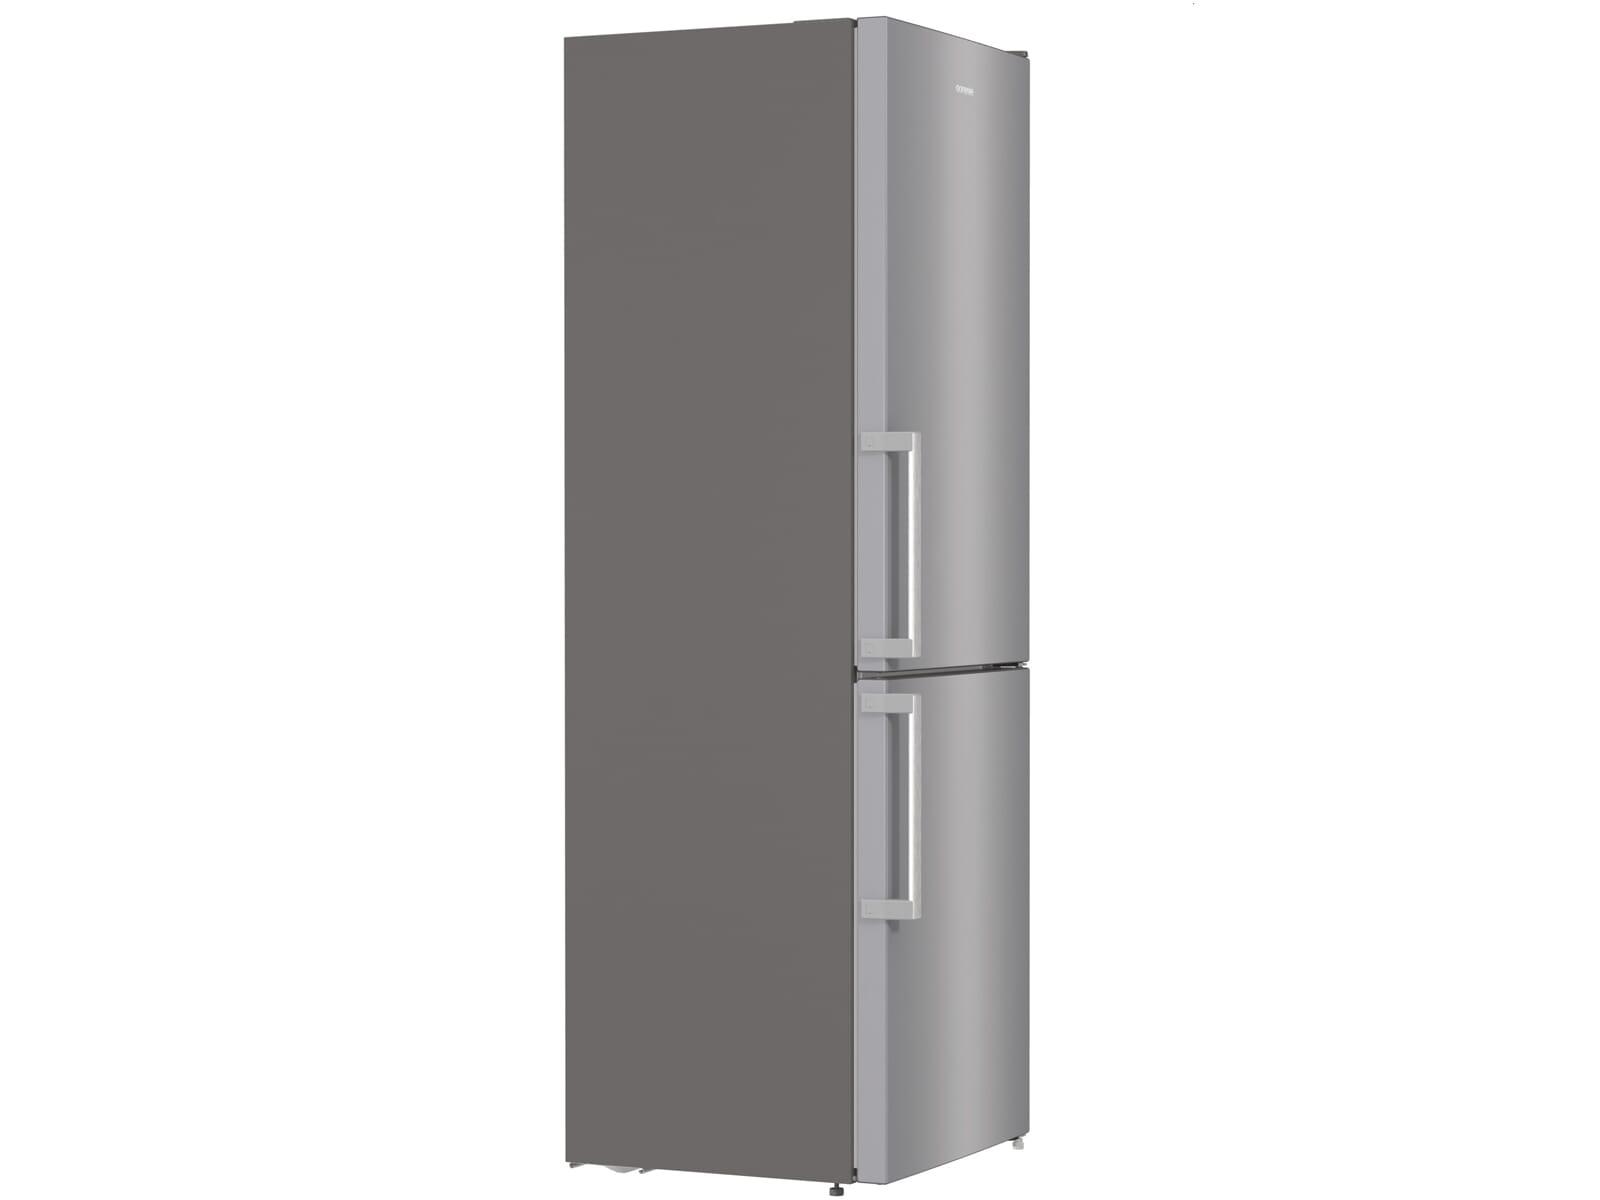 Gorenje NRK 6192 ES5F Kühl-Gefrier-Kombination Grau Metallic